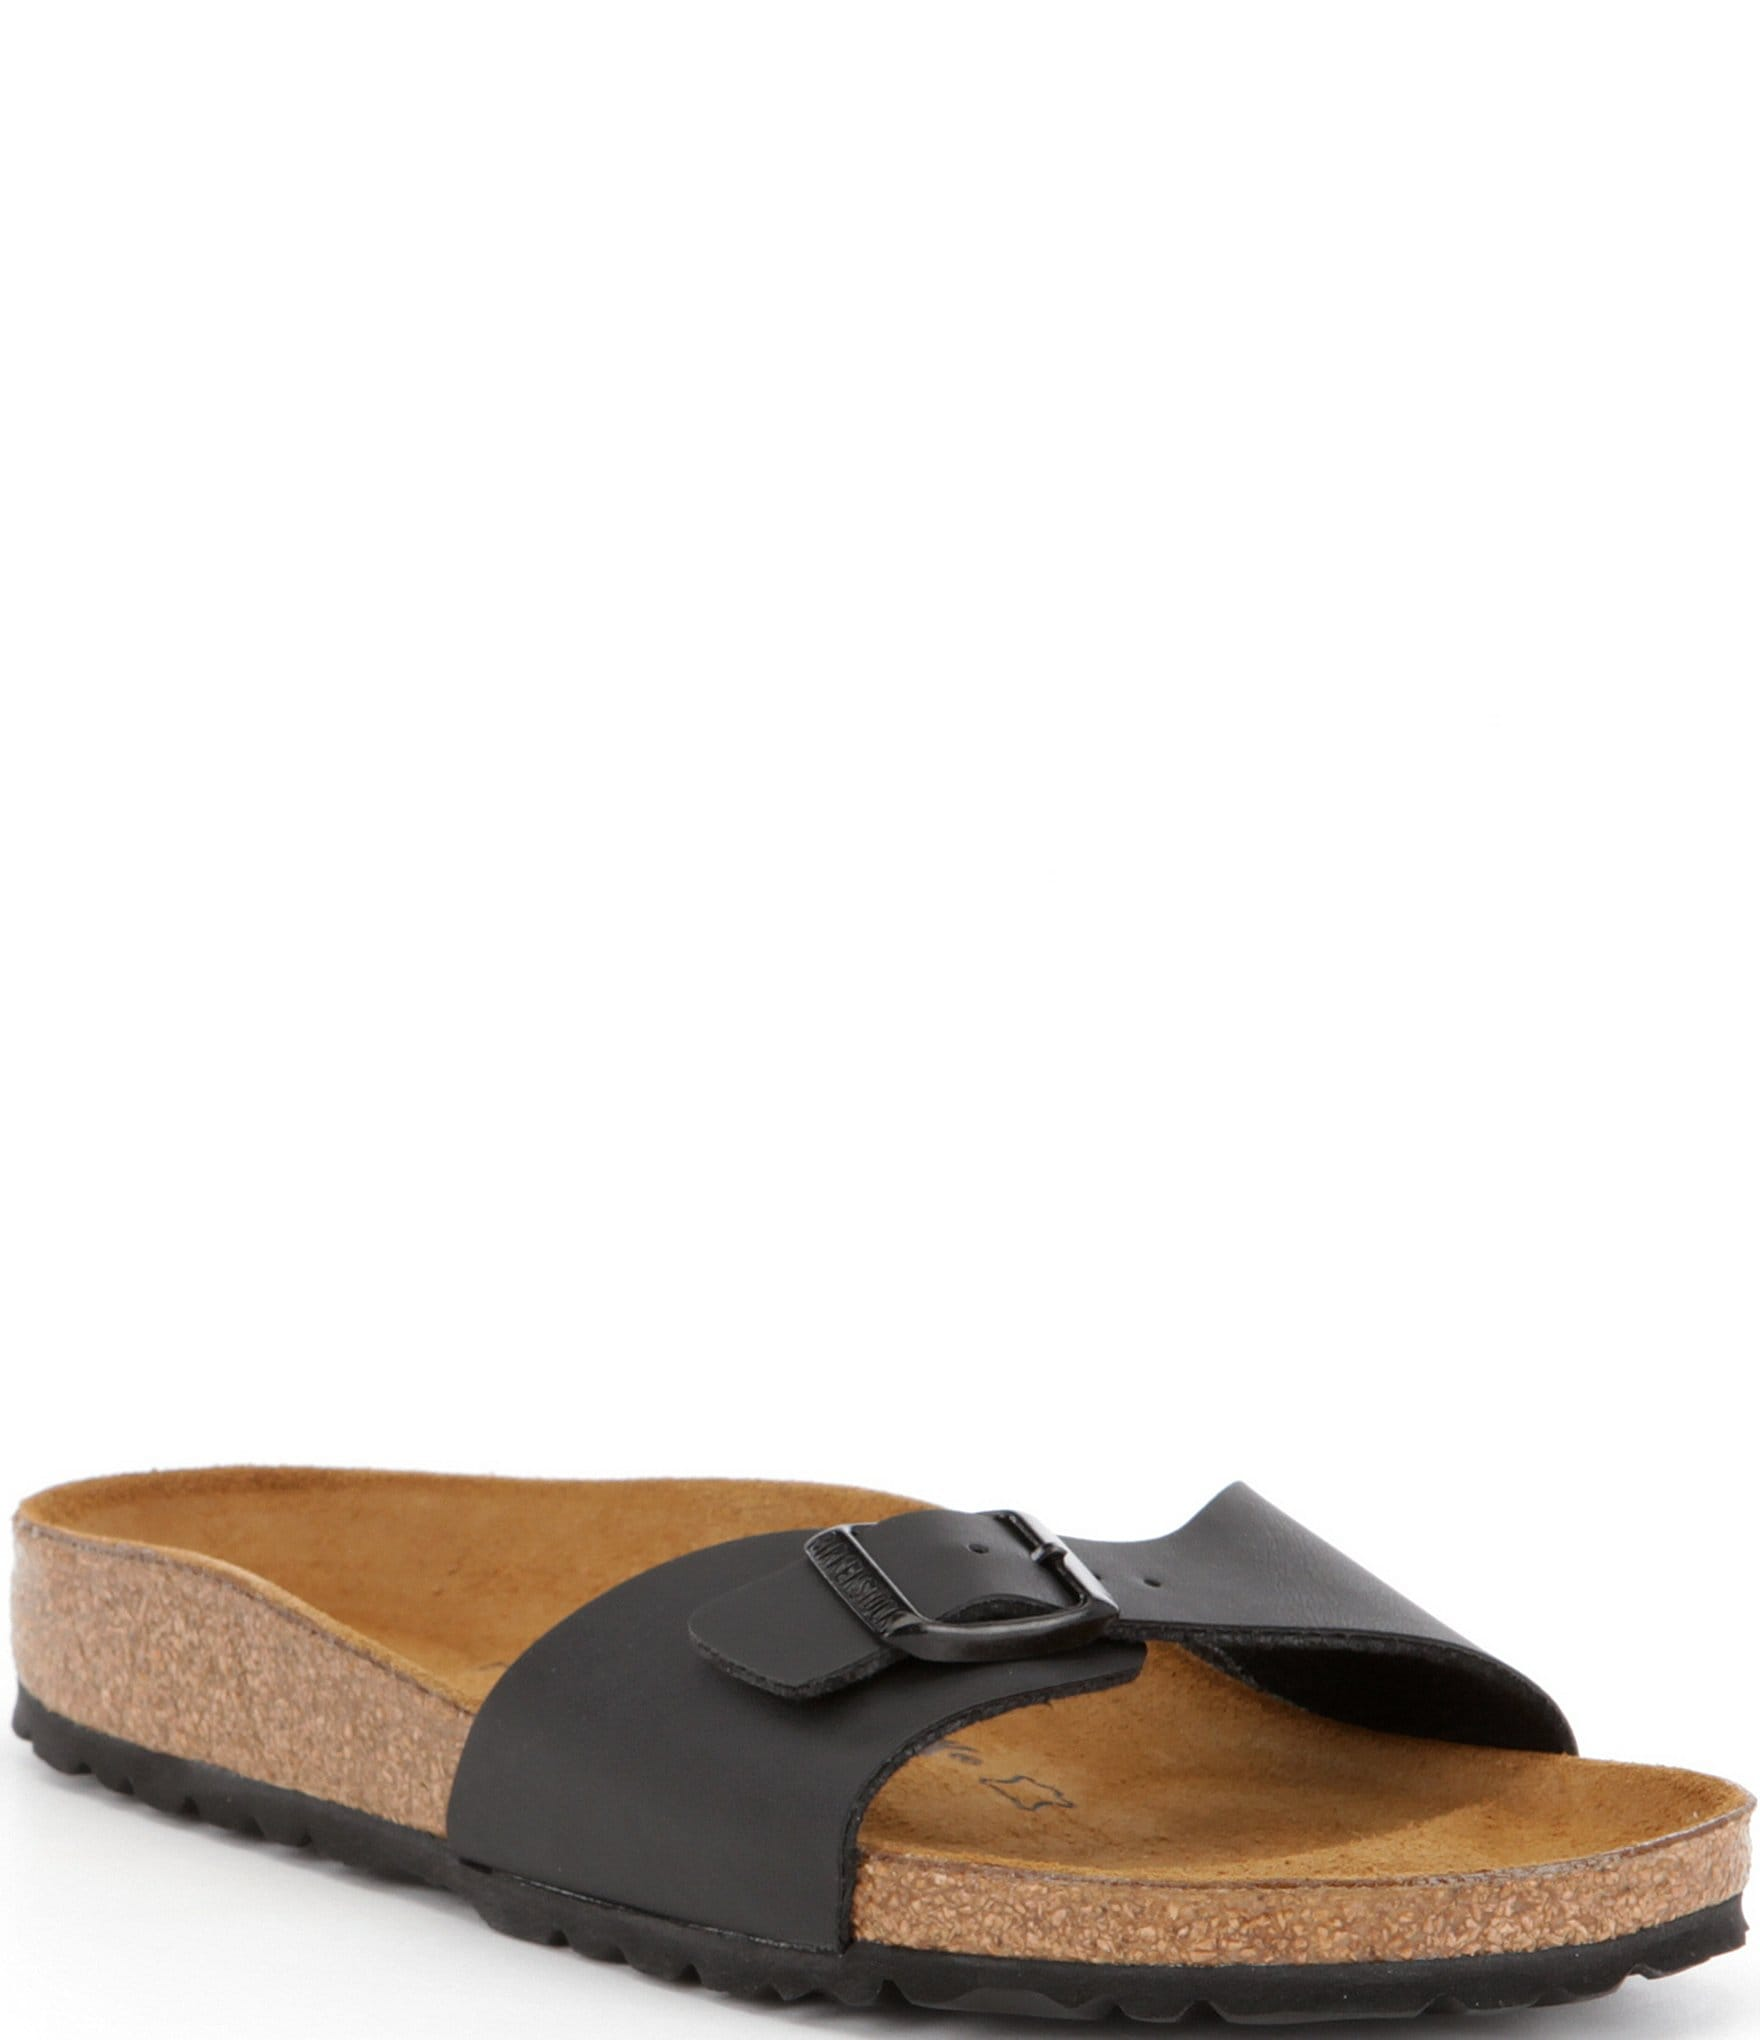 birkenstock women s madrid sandals dillards. Black Bedroom Furniture Sets. Home Design Ideas